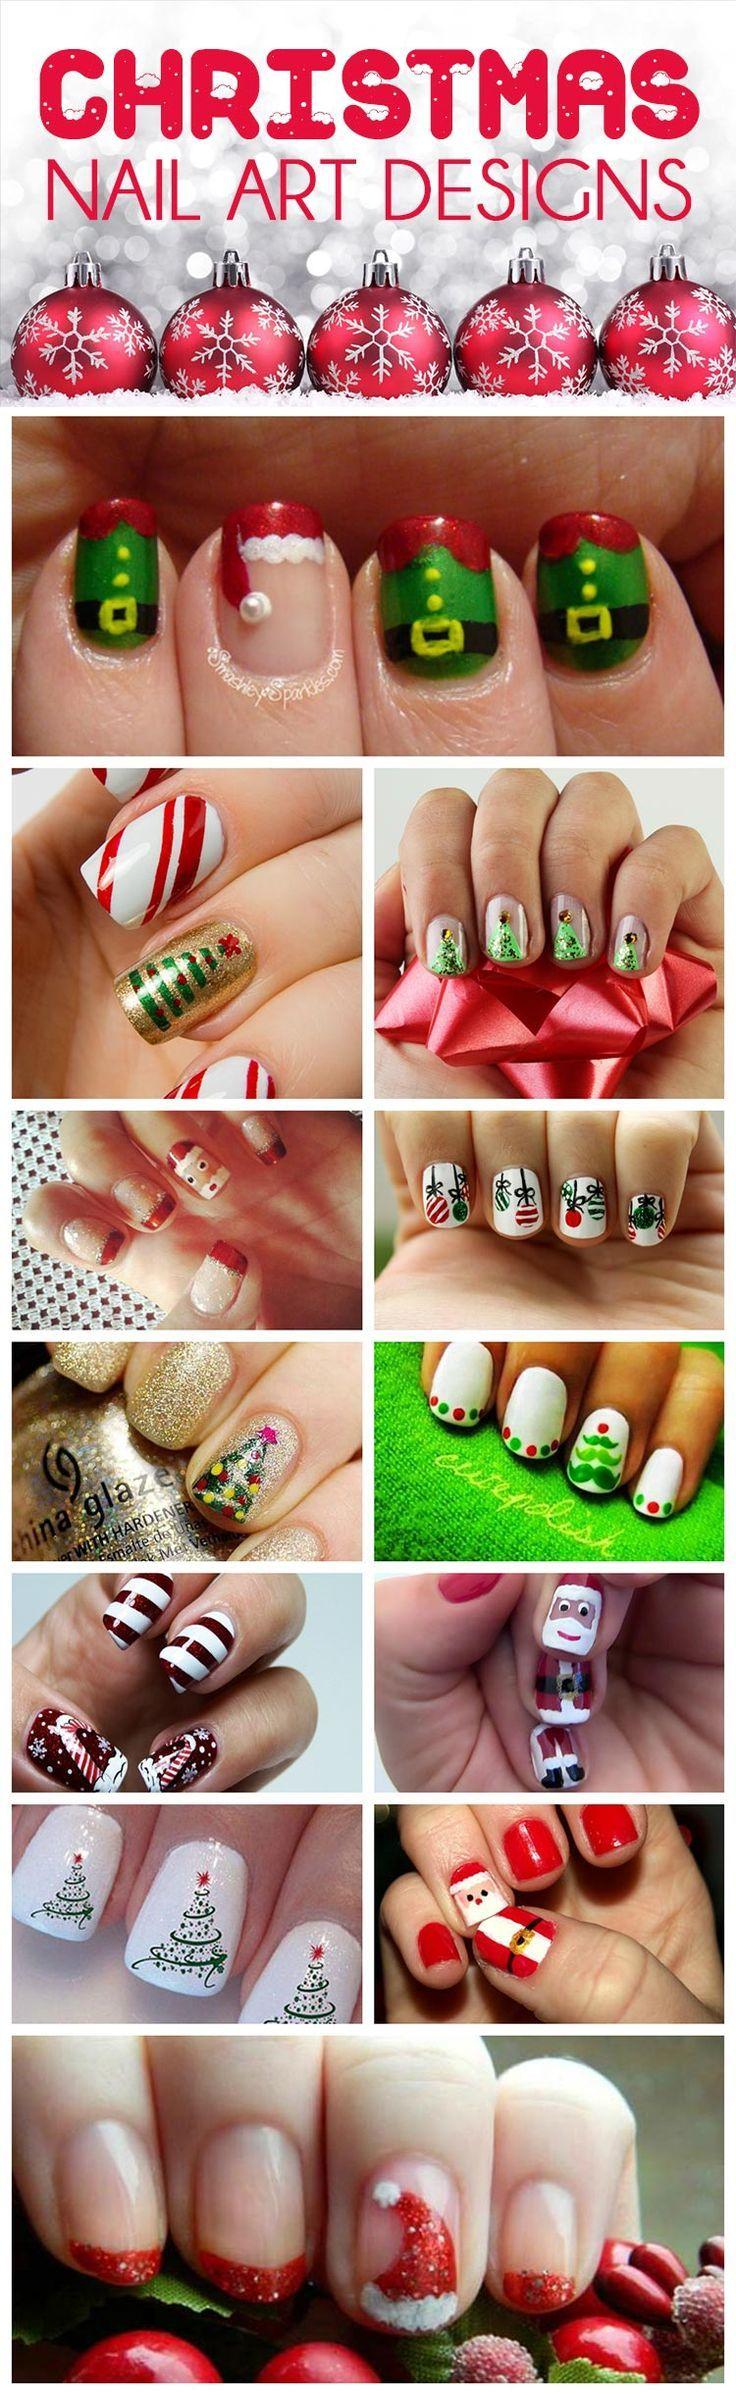 Pin by Dana Wright on Nails in   Pinterest  Toe nail art